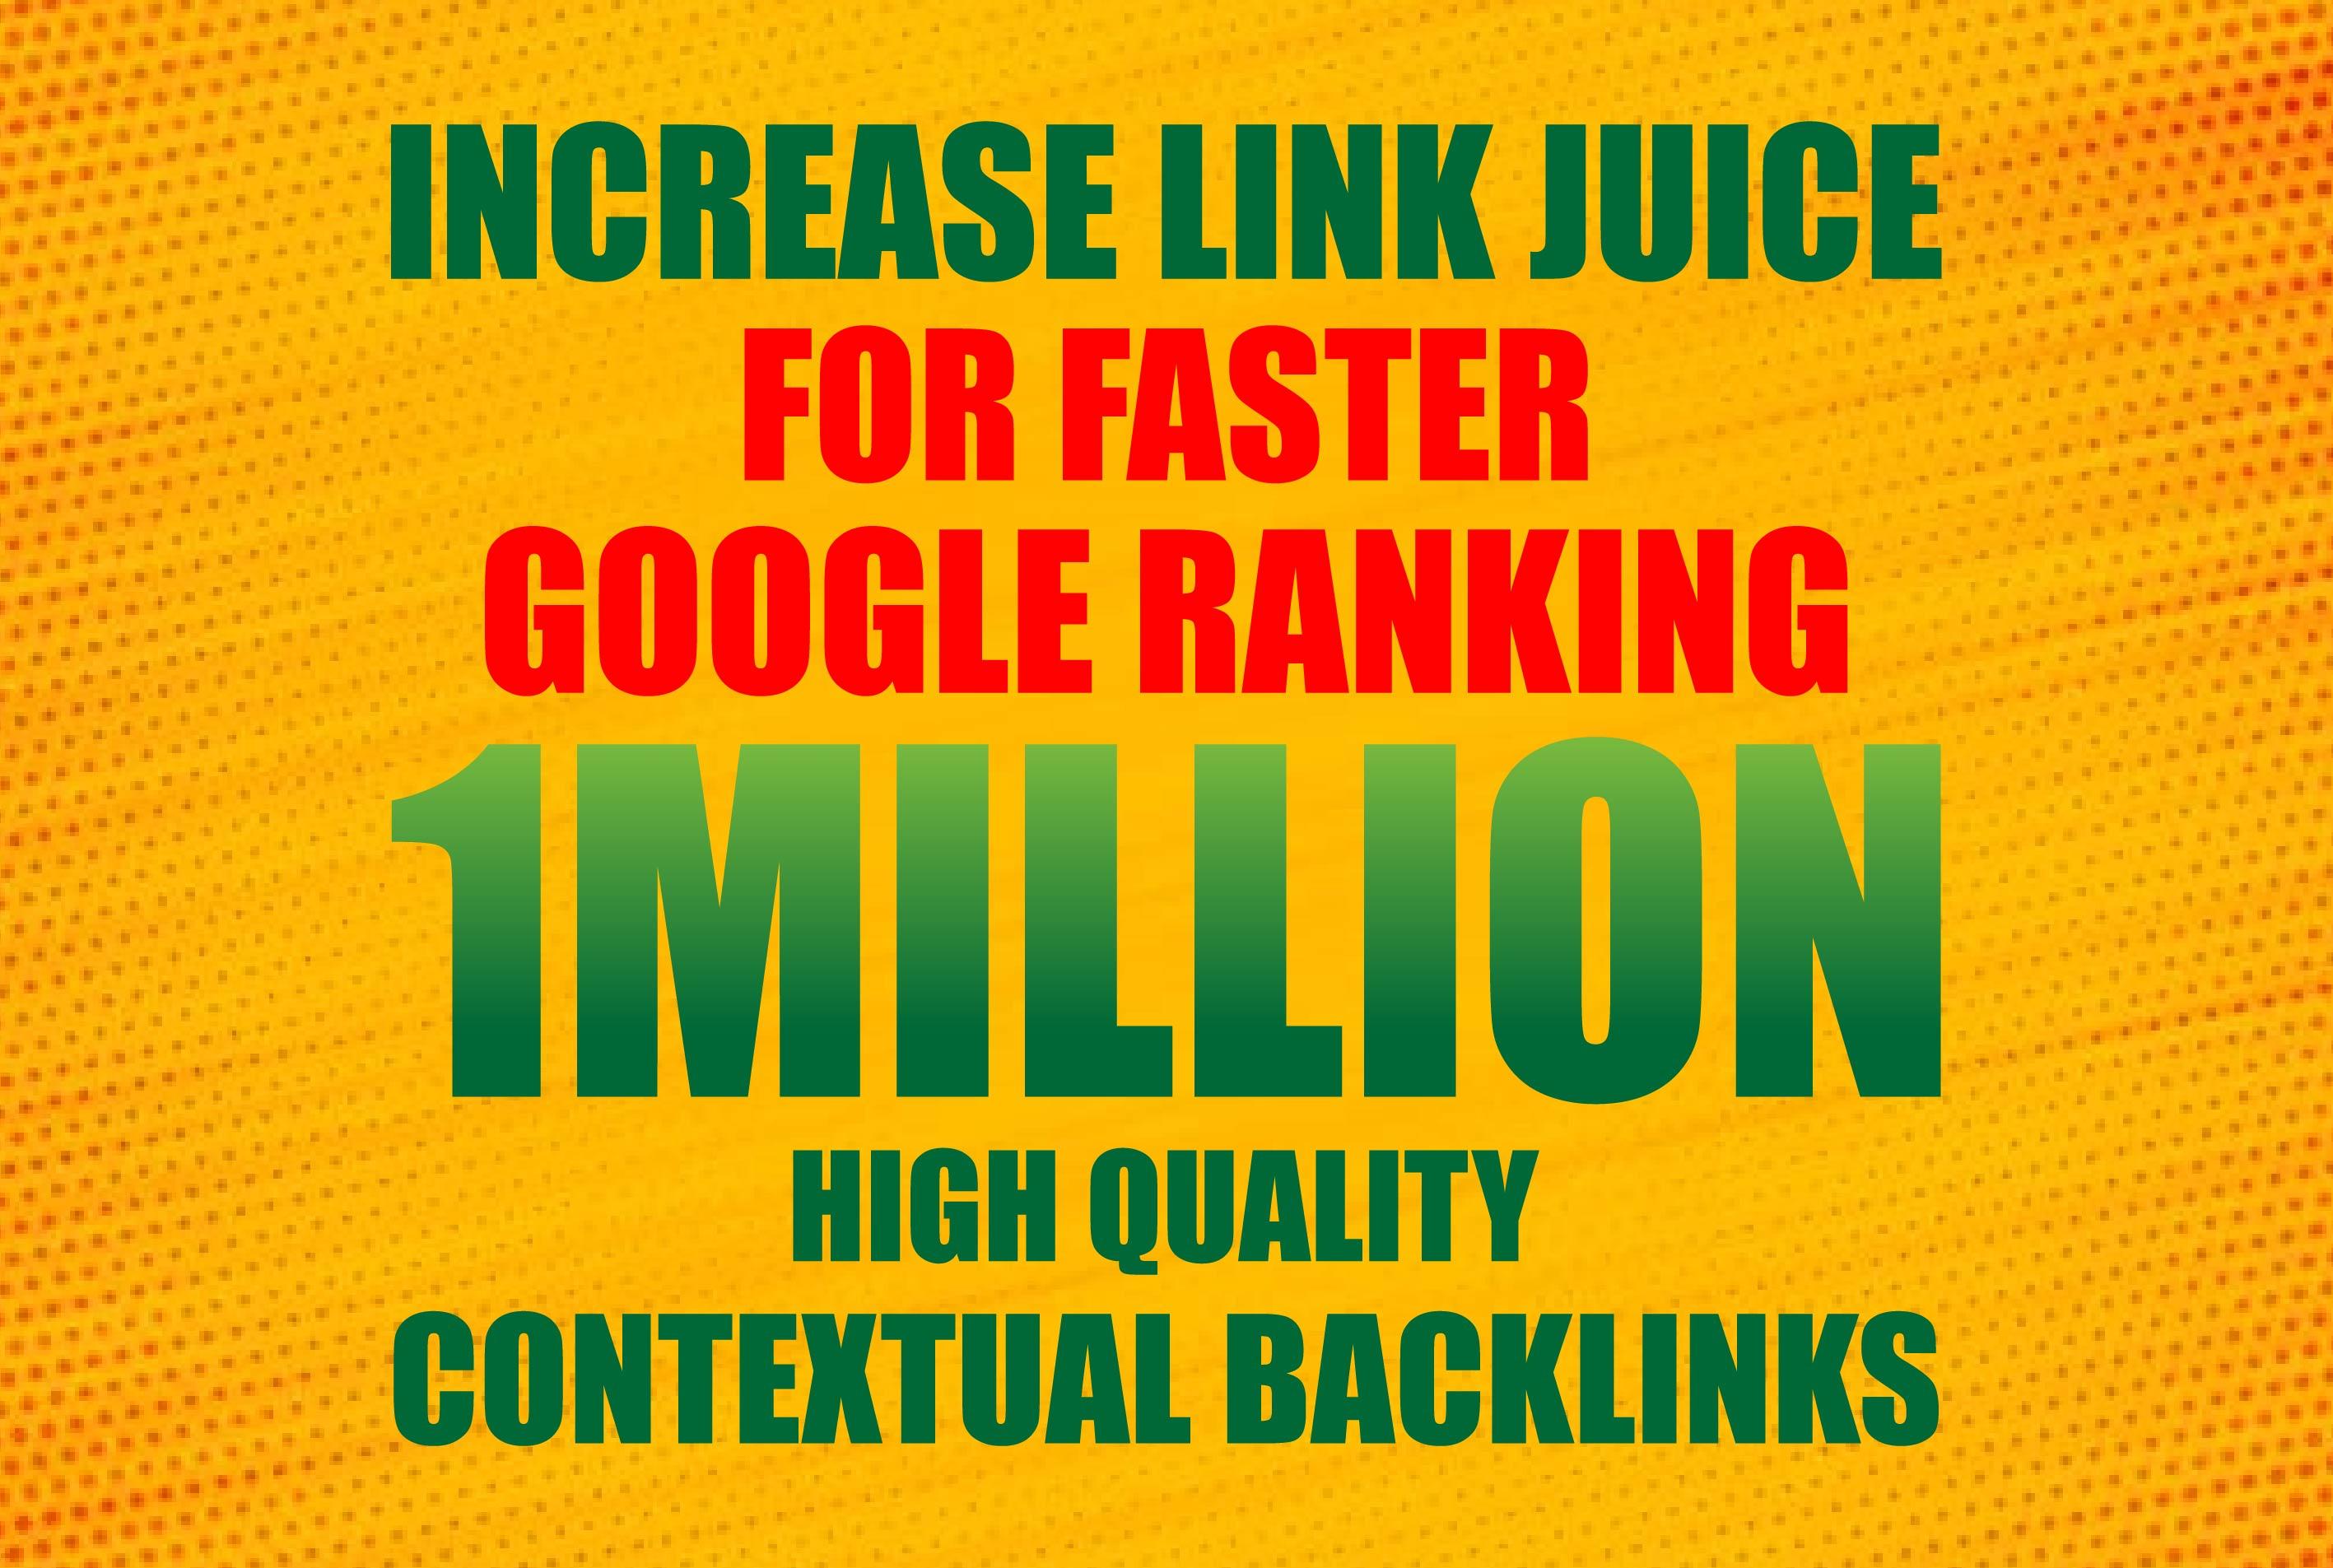 Do 1Million HQ Contextual Backlinks